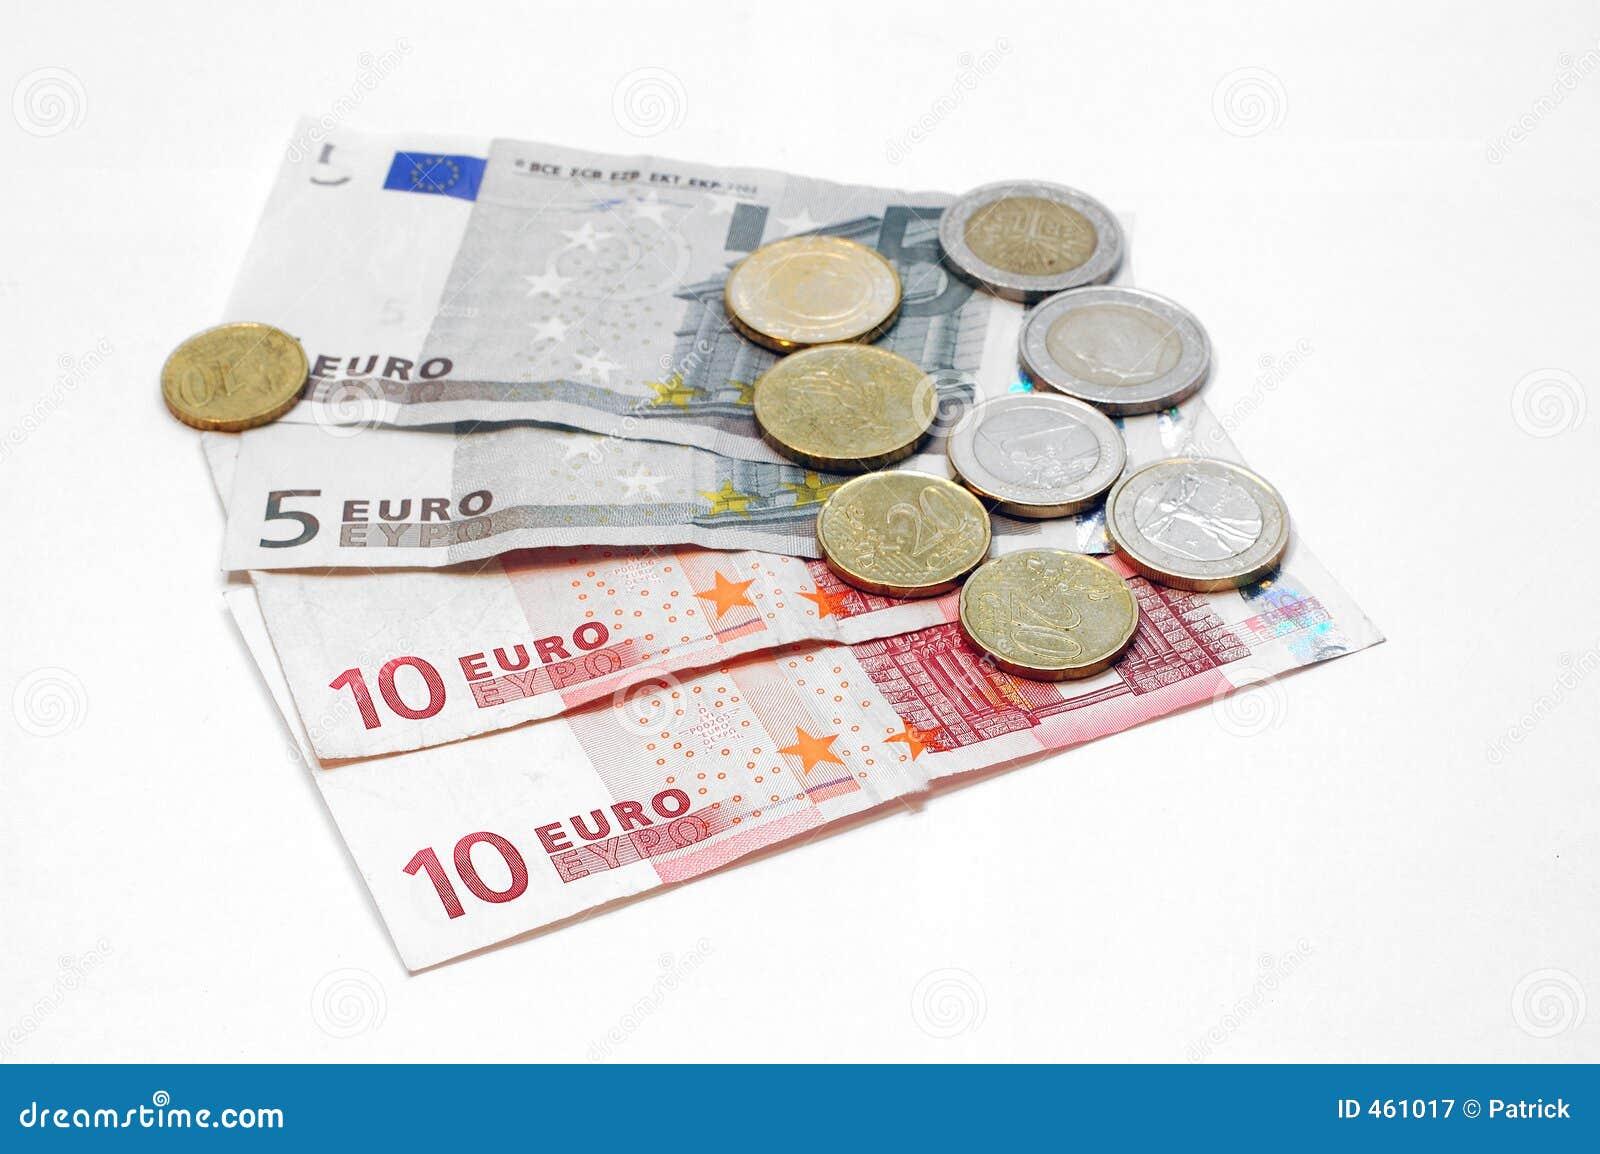 Money makes the world go around, Euro